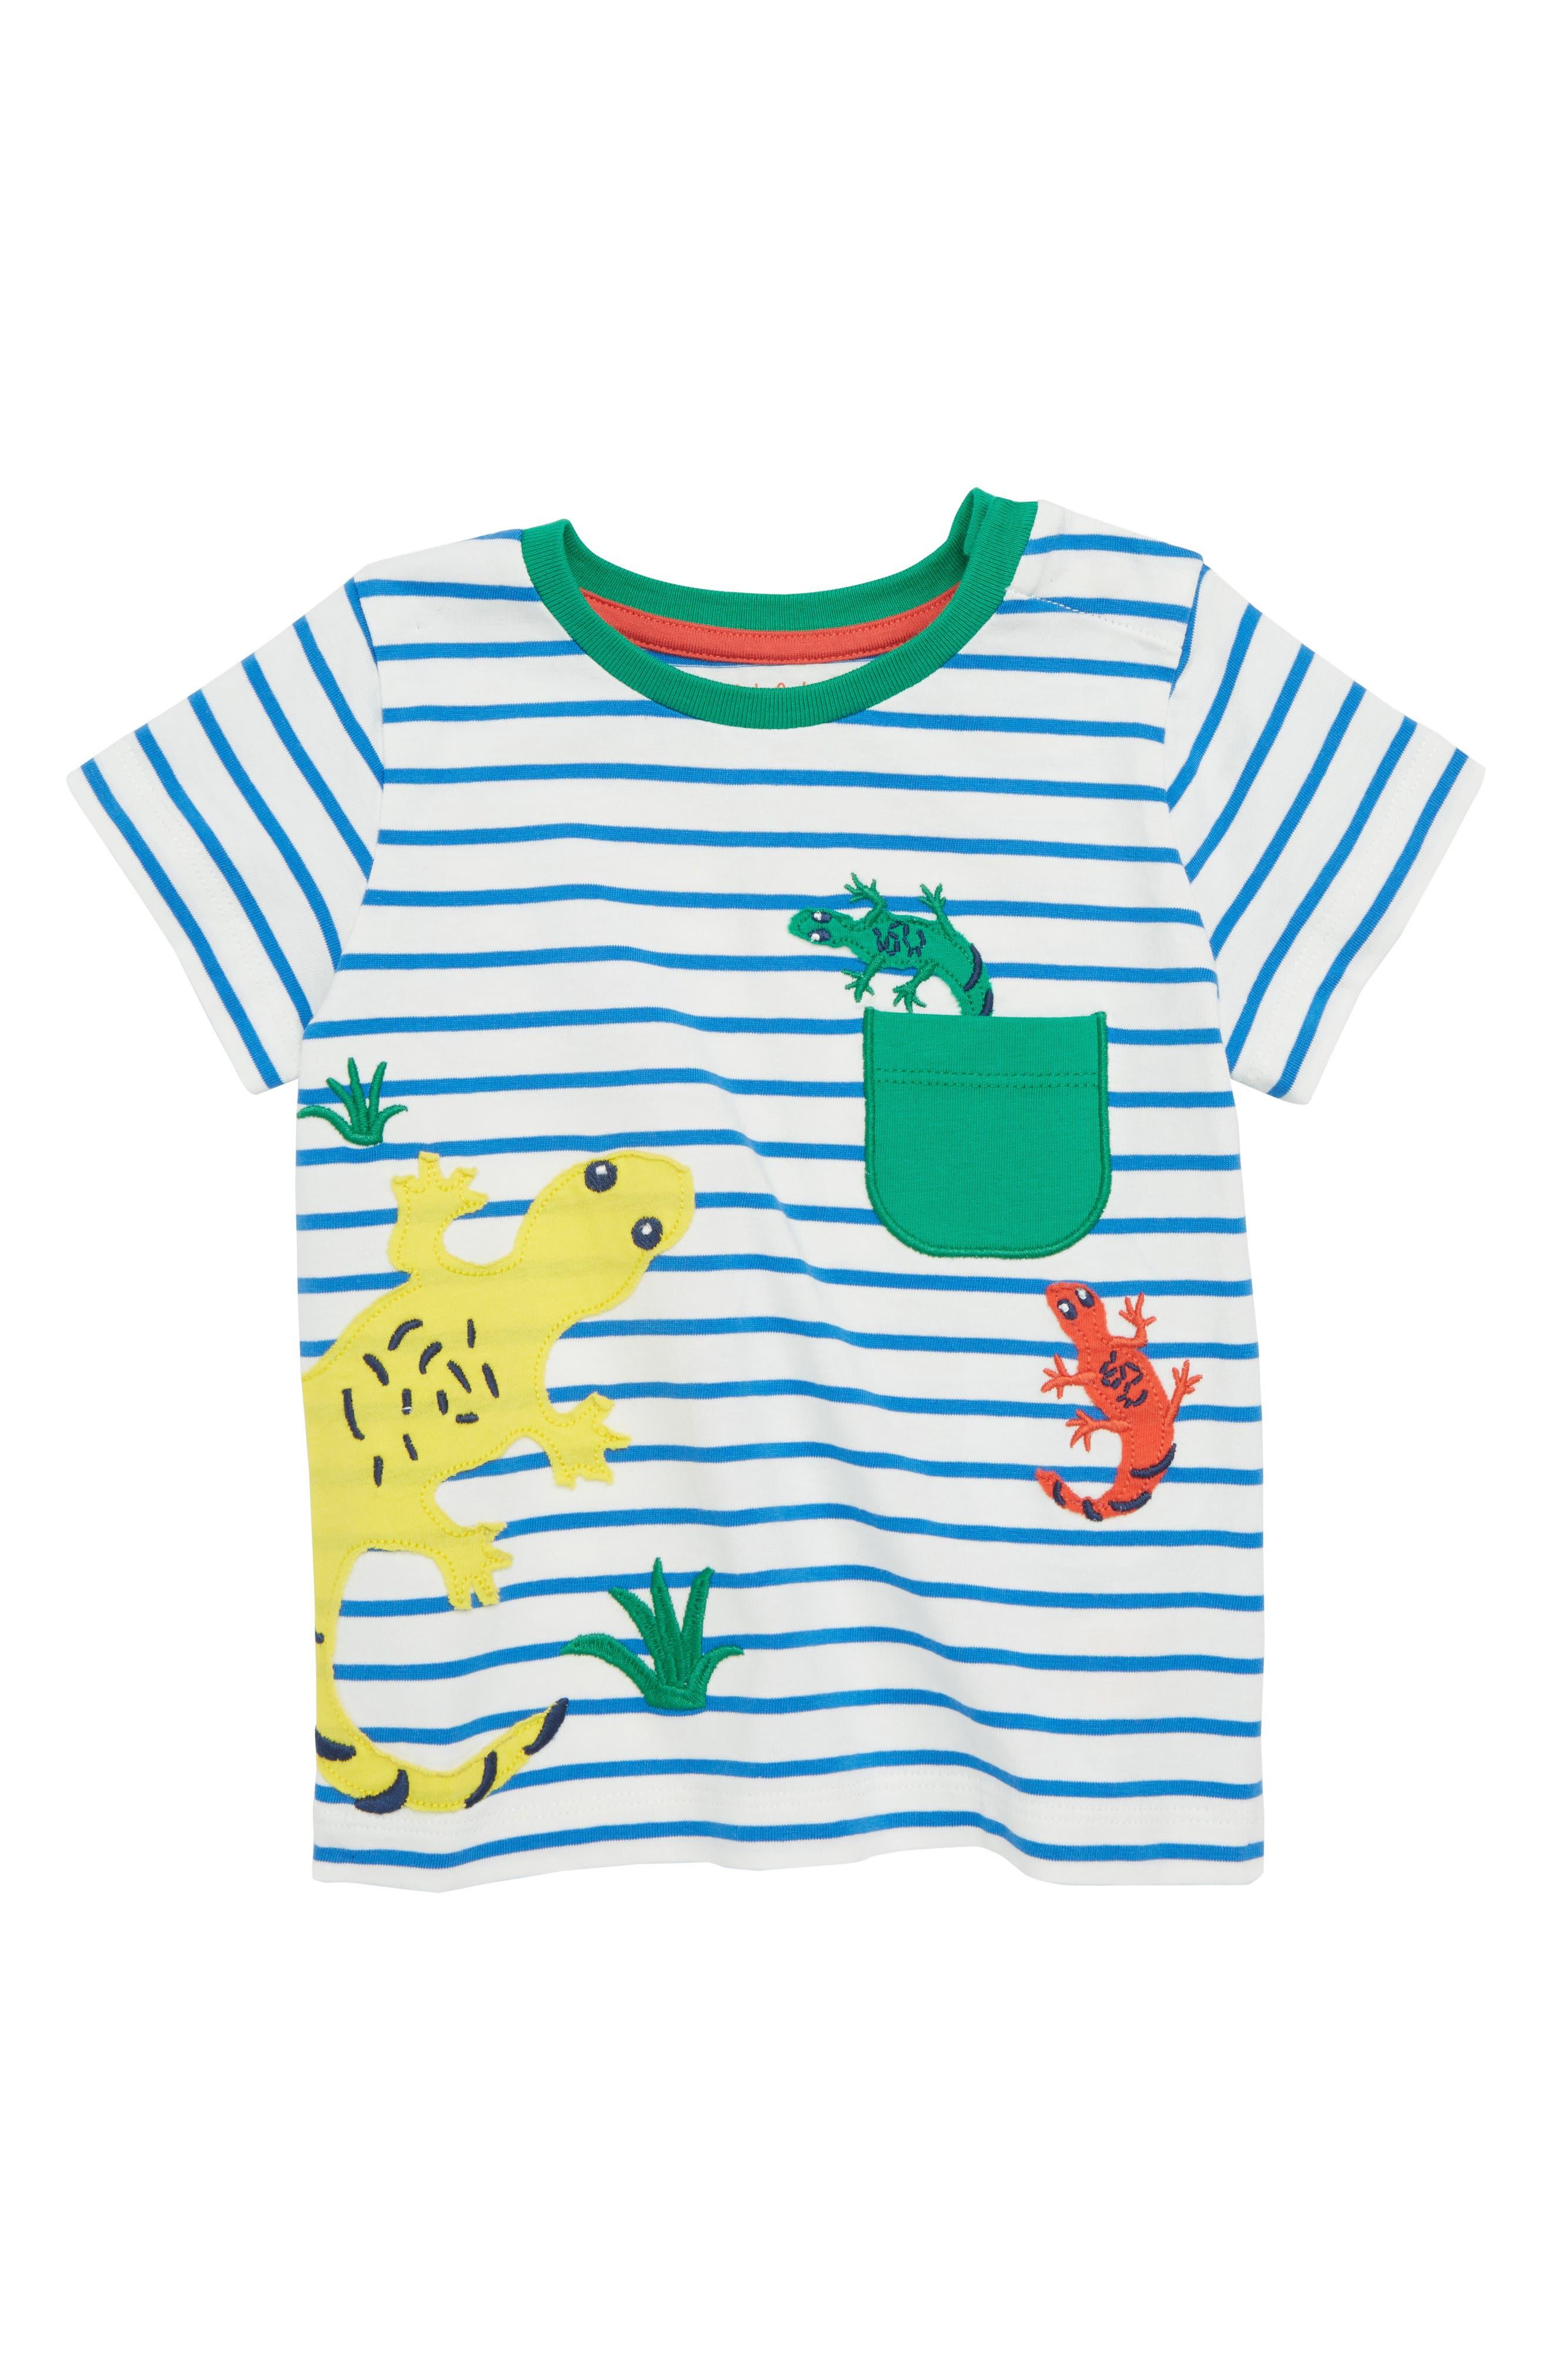 Pocket Friends T-Shirt,                             Main thumbnail 1, color,